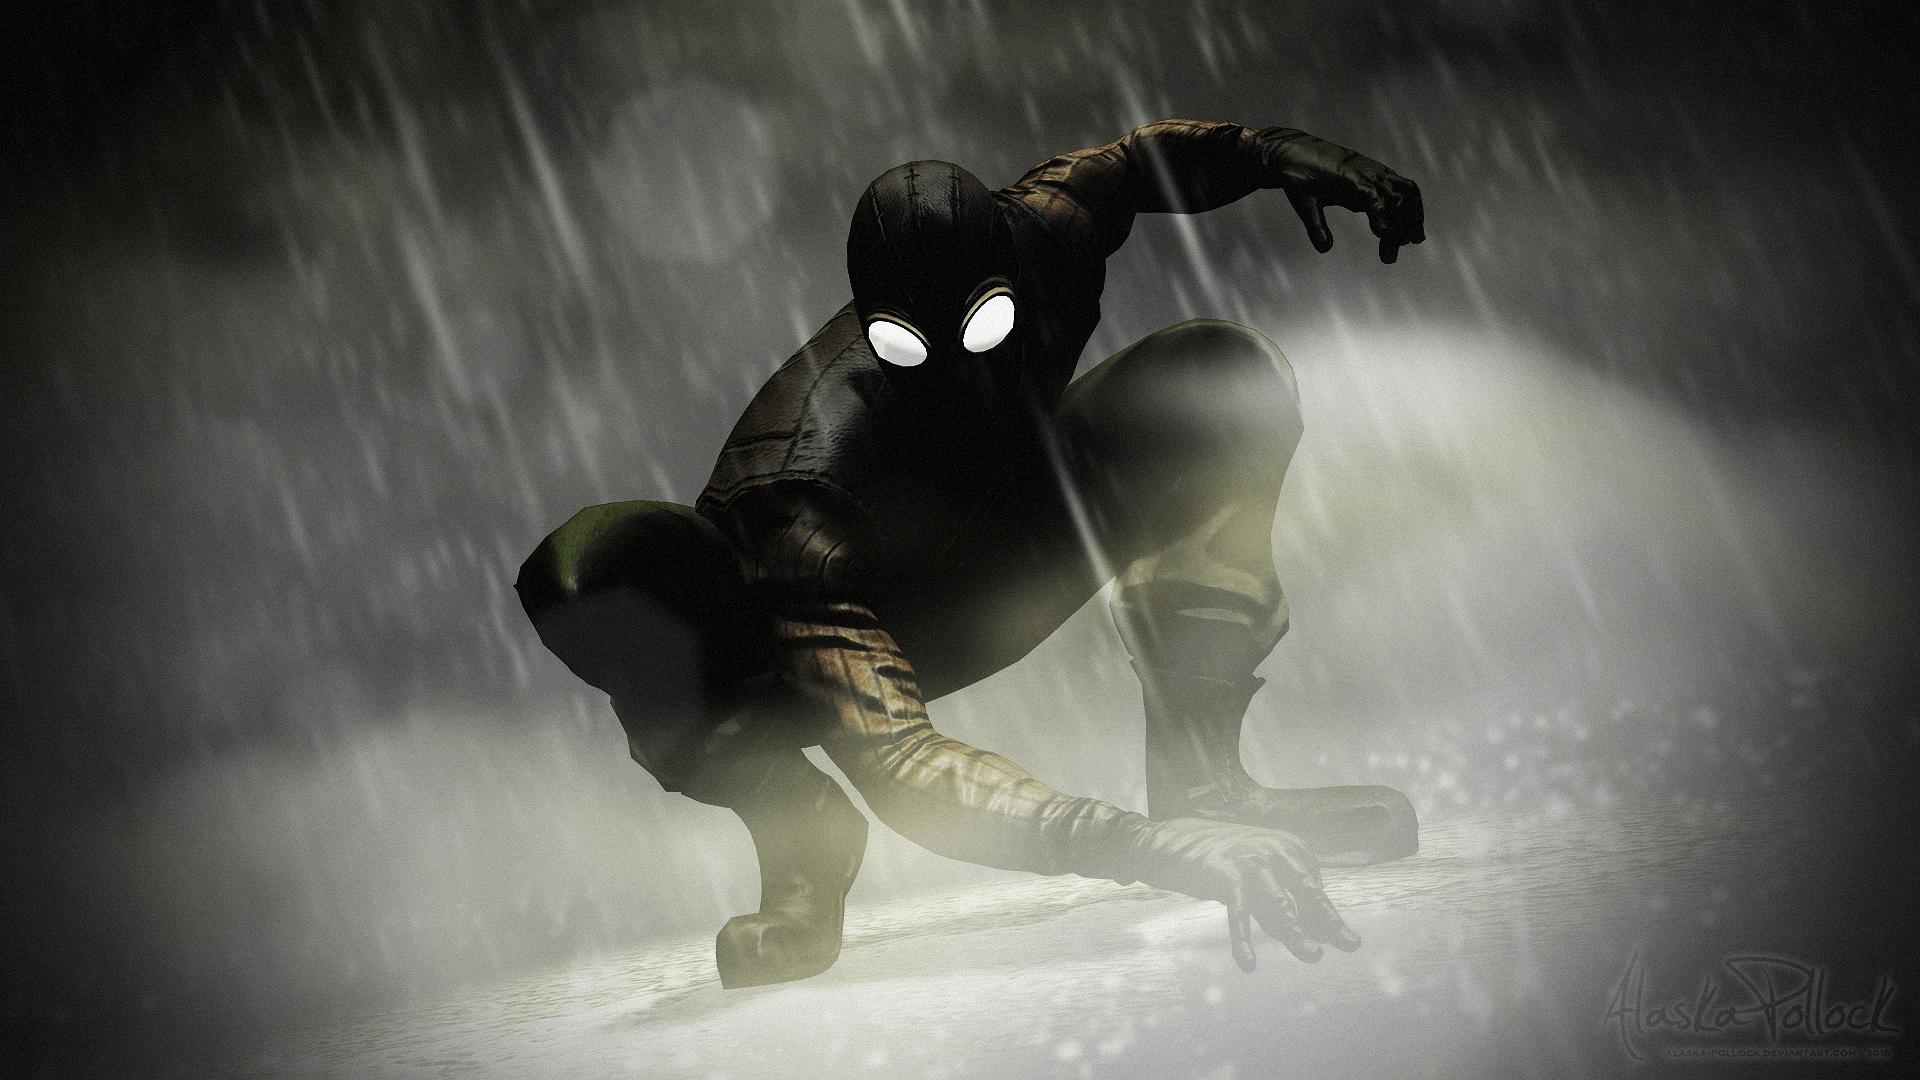 Spider Man Noir Wallpapers Wallpaper Cave